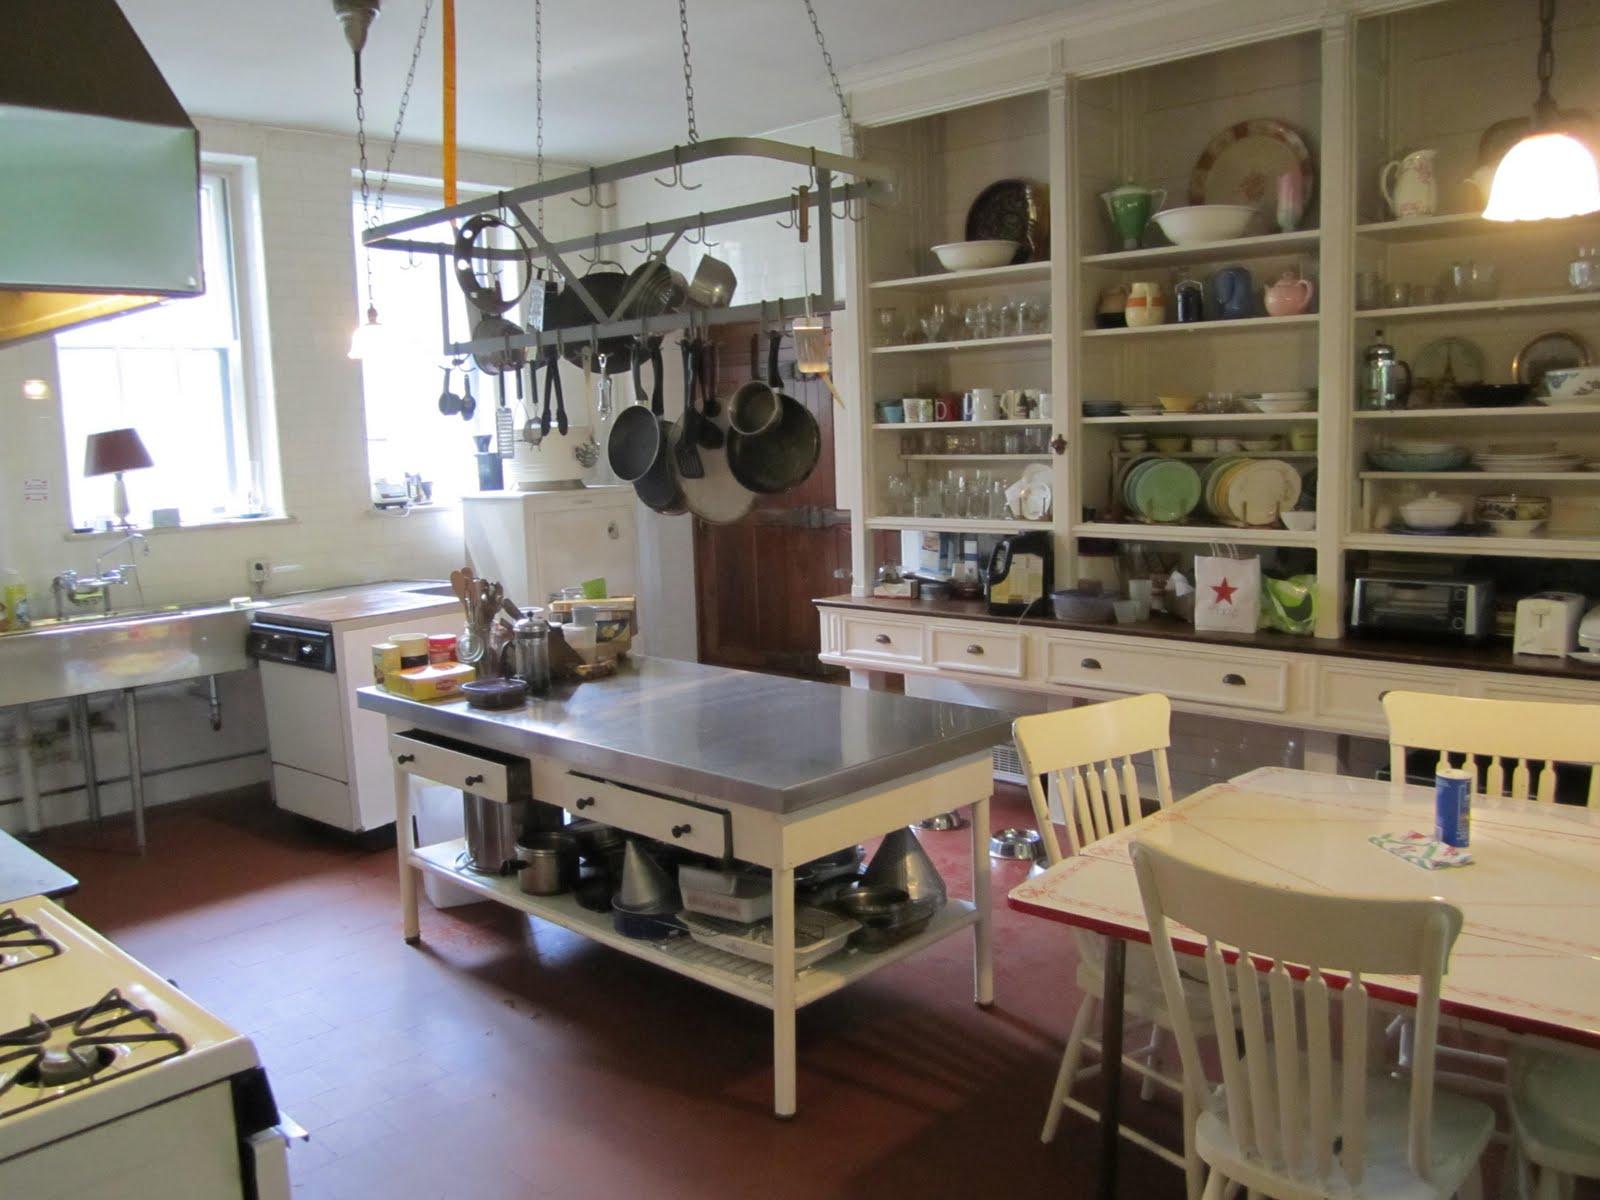 my kitchen 1 of 2 kitchen prep tables My Kitchen 1 of 2